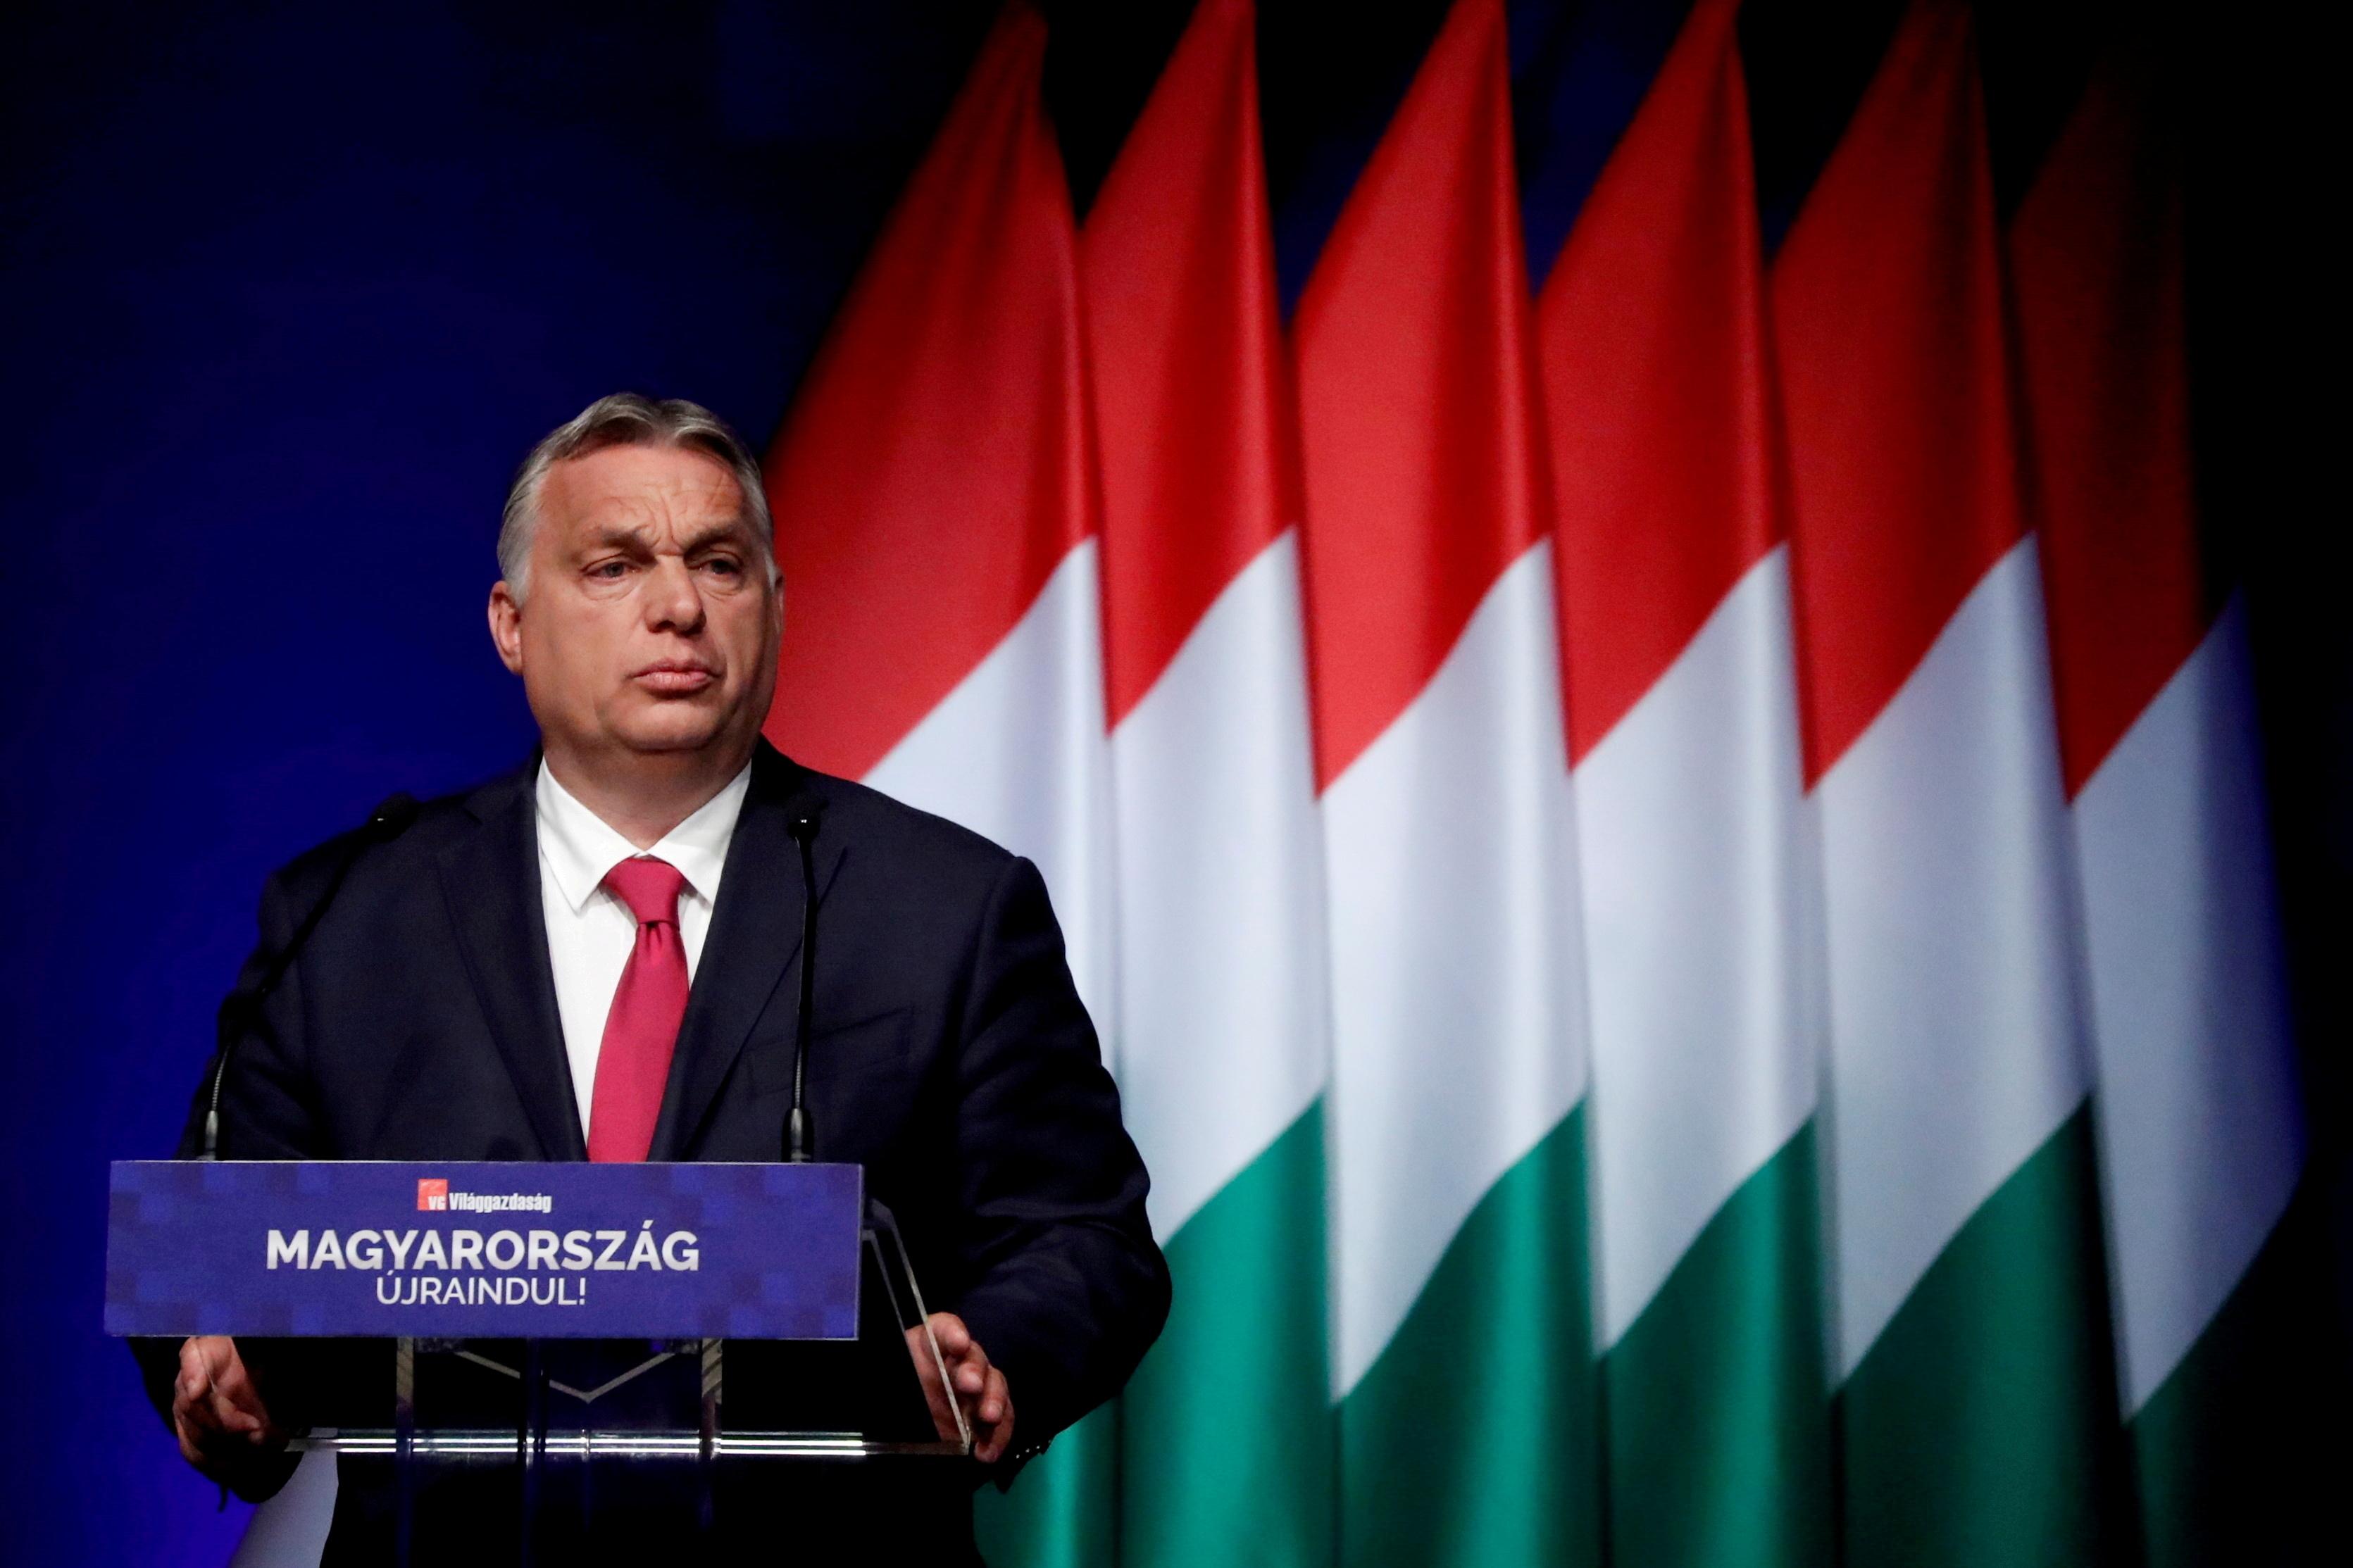 Hungarian Prime Minister Viktor Orban addresses a business conference in Budapest, Hungary, June 9, 2021. REUTERS/Bernadett Szabo/File Photo